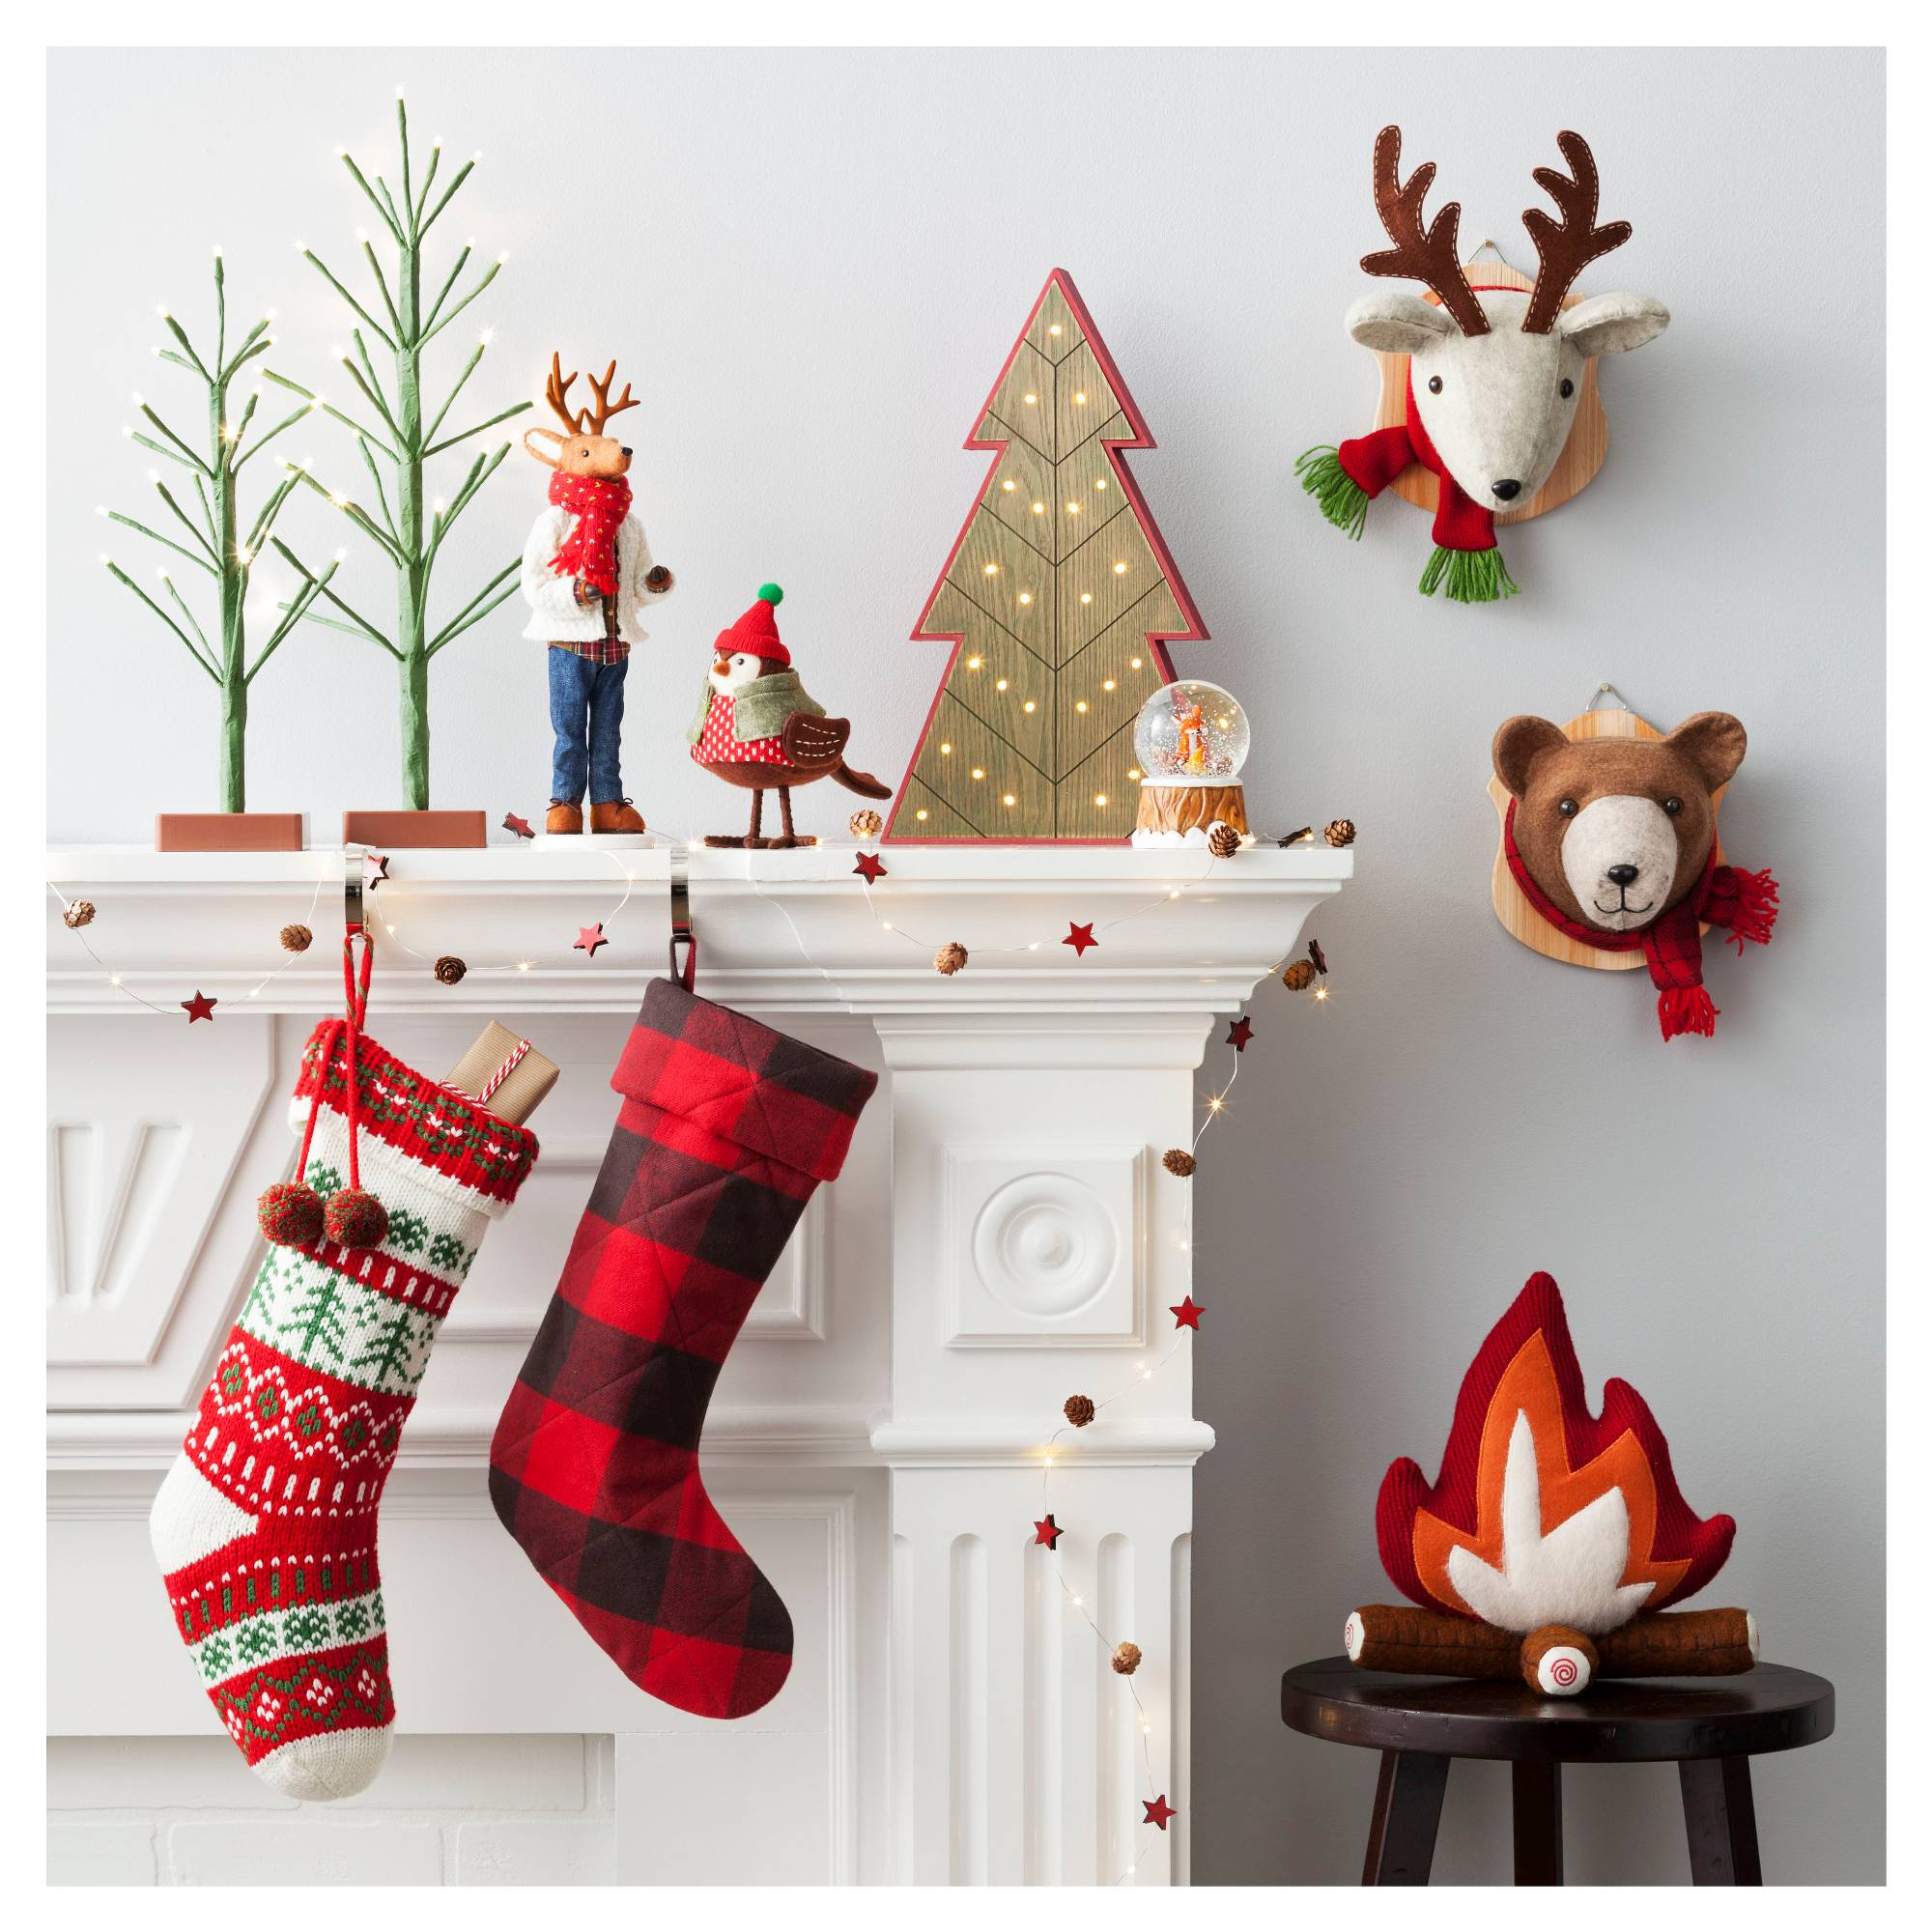 Target Christmas Decorations Holiday Home Decor - Camp Christmas Tree